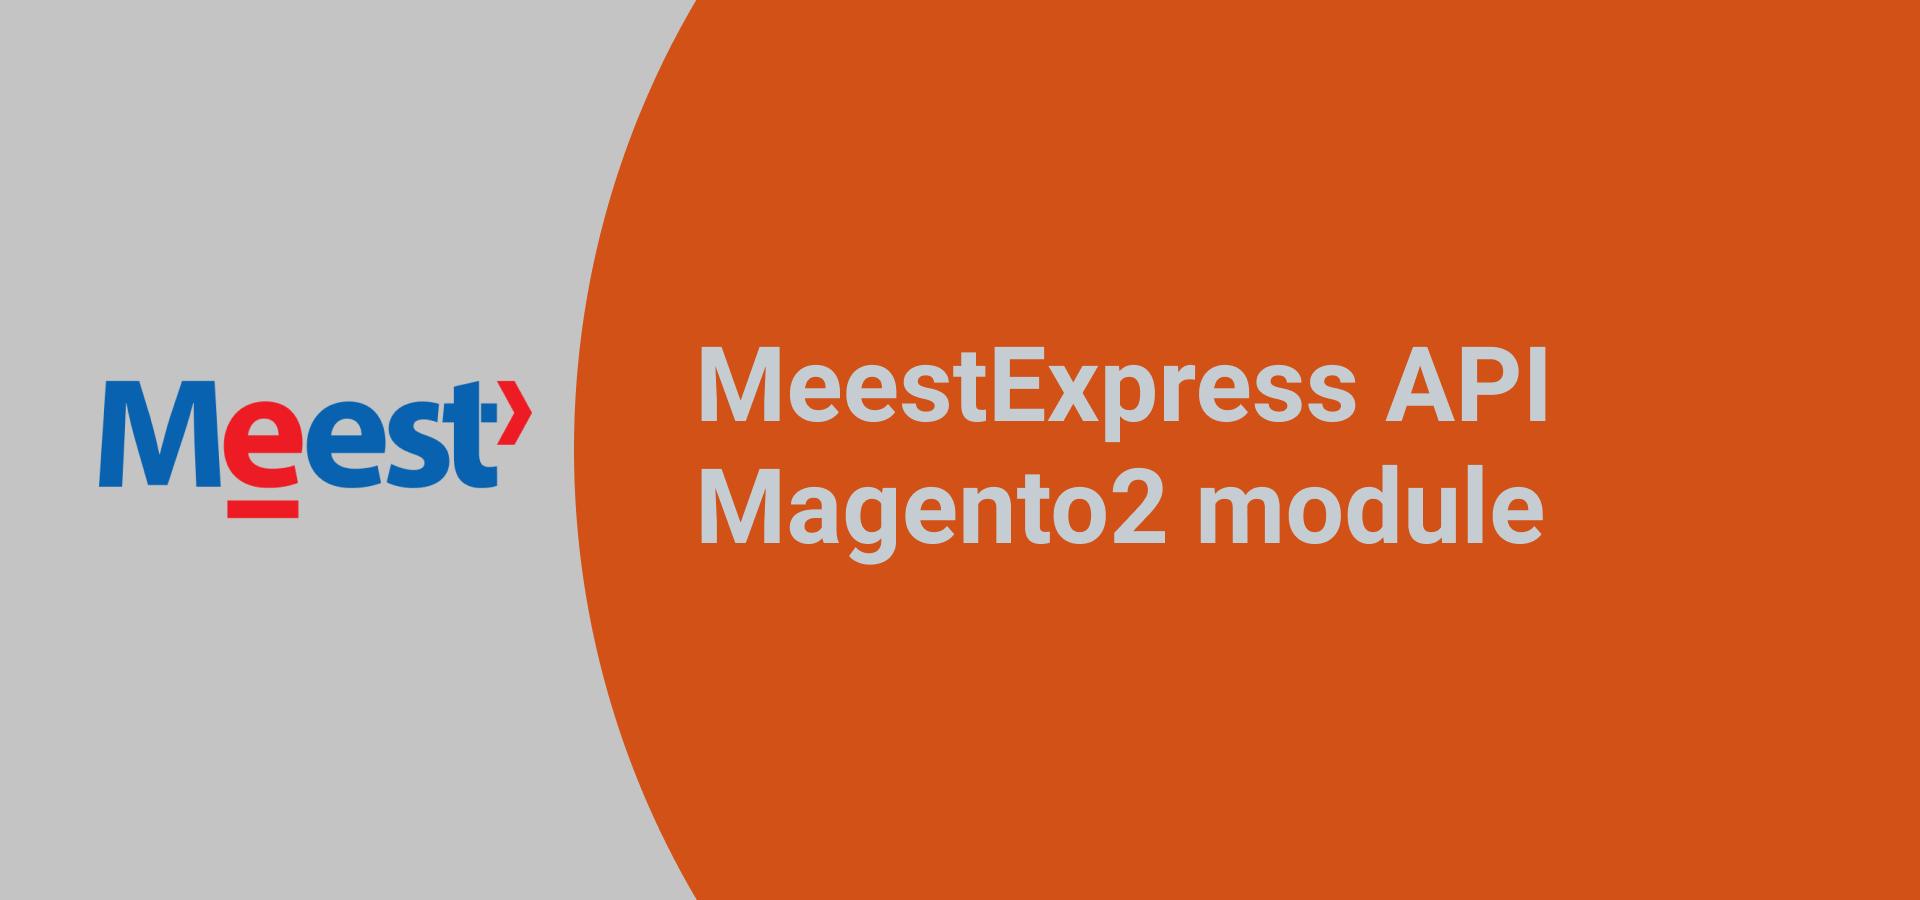 MeestExpress API Magento2 module